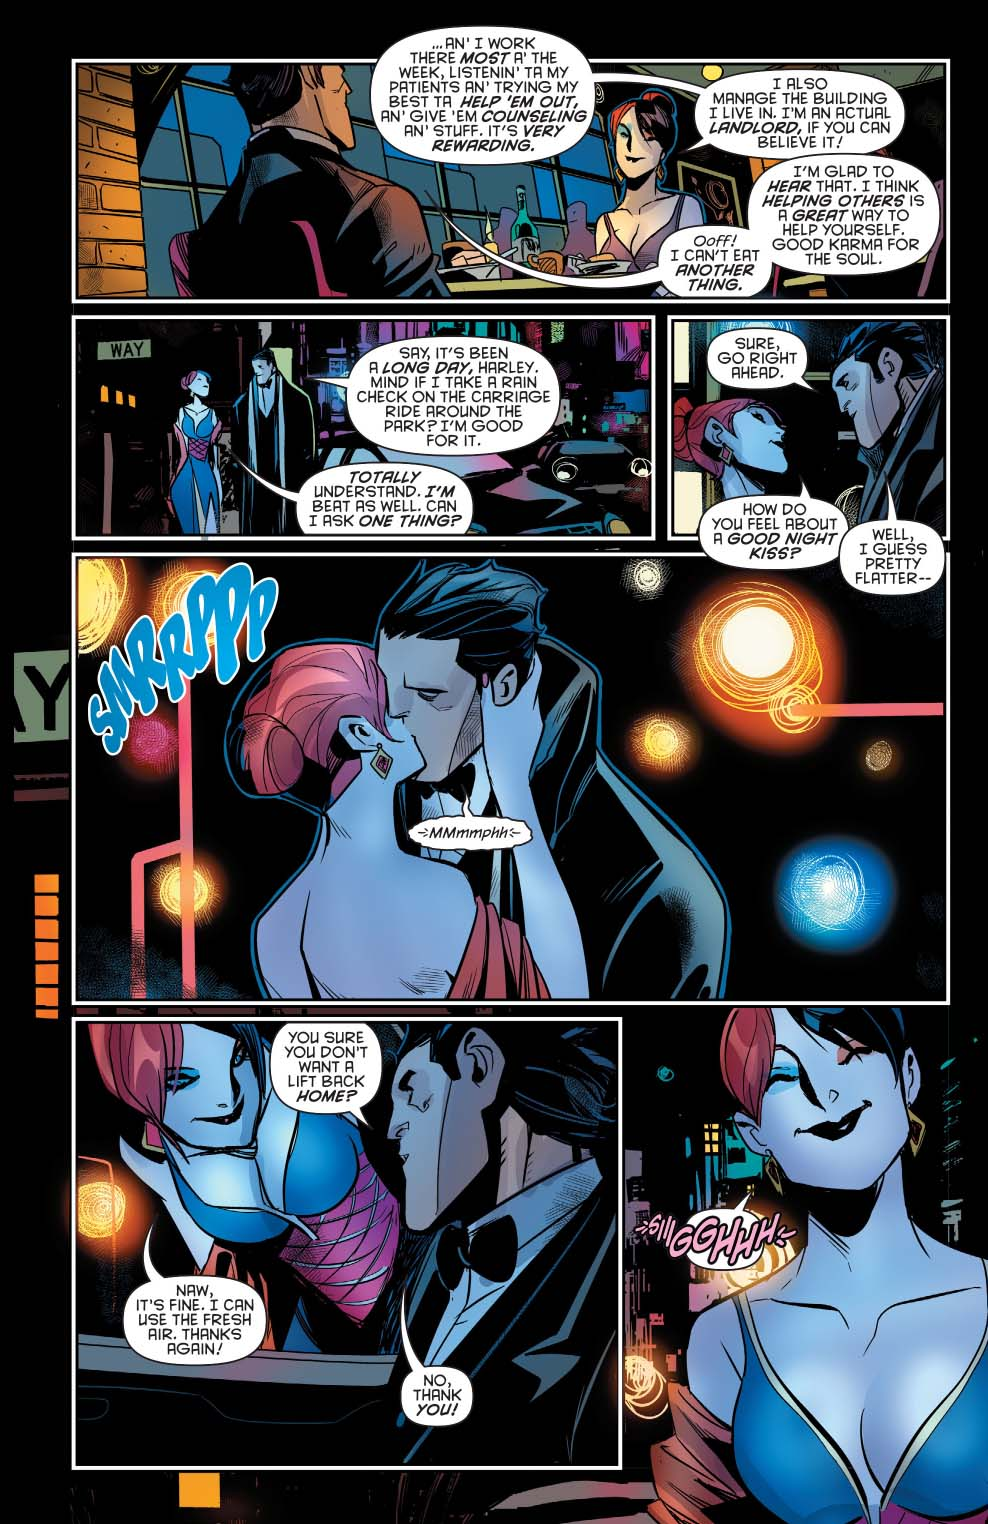 Dans l'ombre du chevalier noir › Batman's link - Page 3 443234brucewaynegoesonadatewithharleyquinn